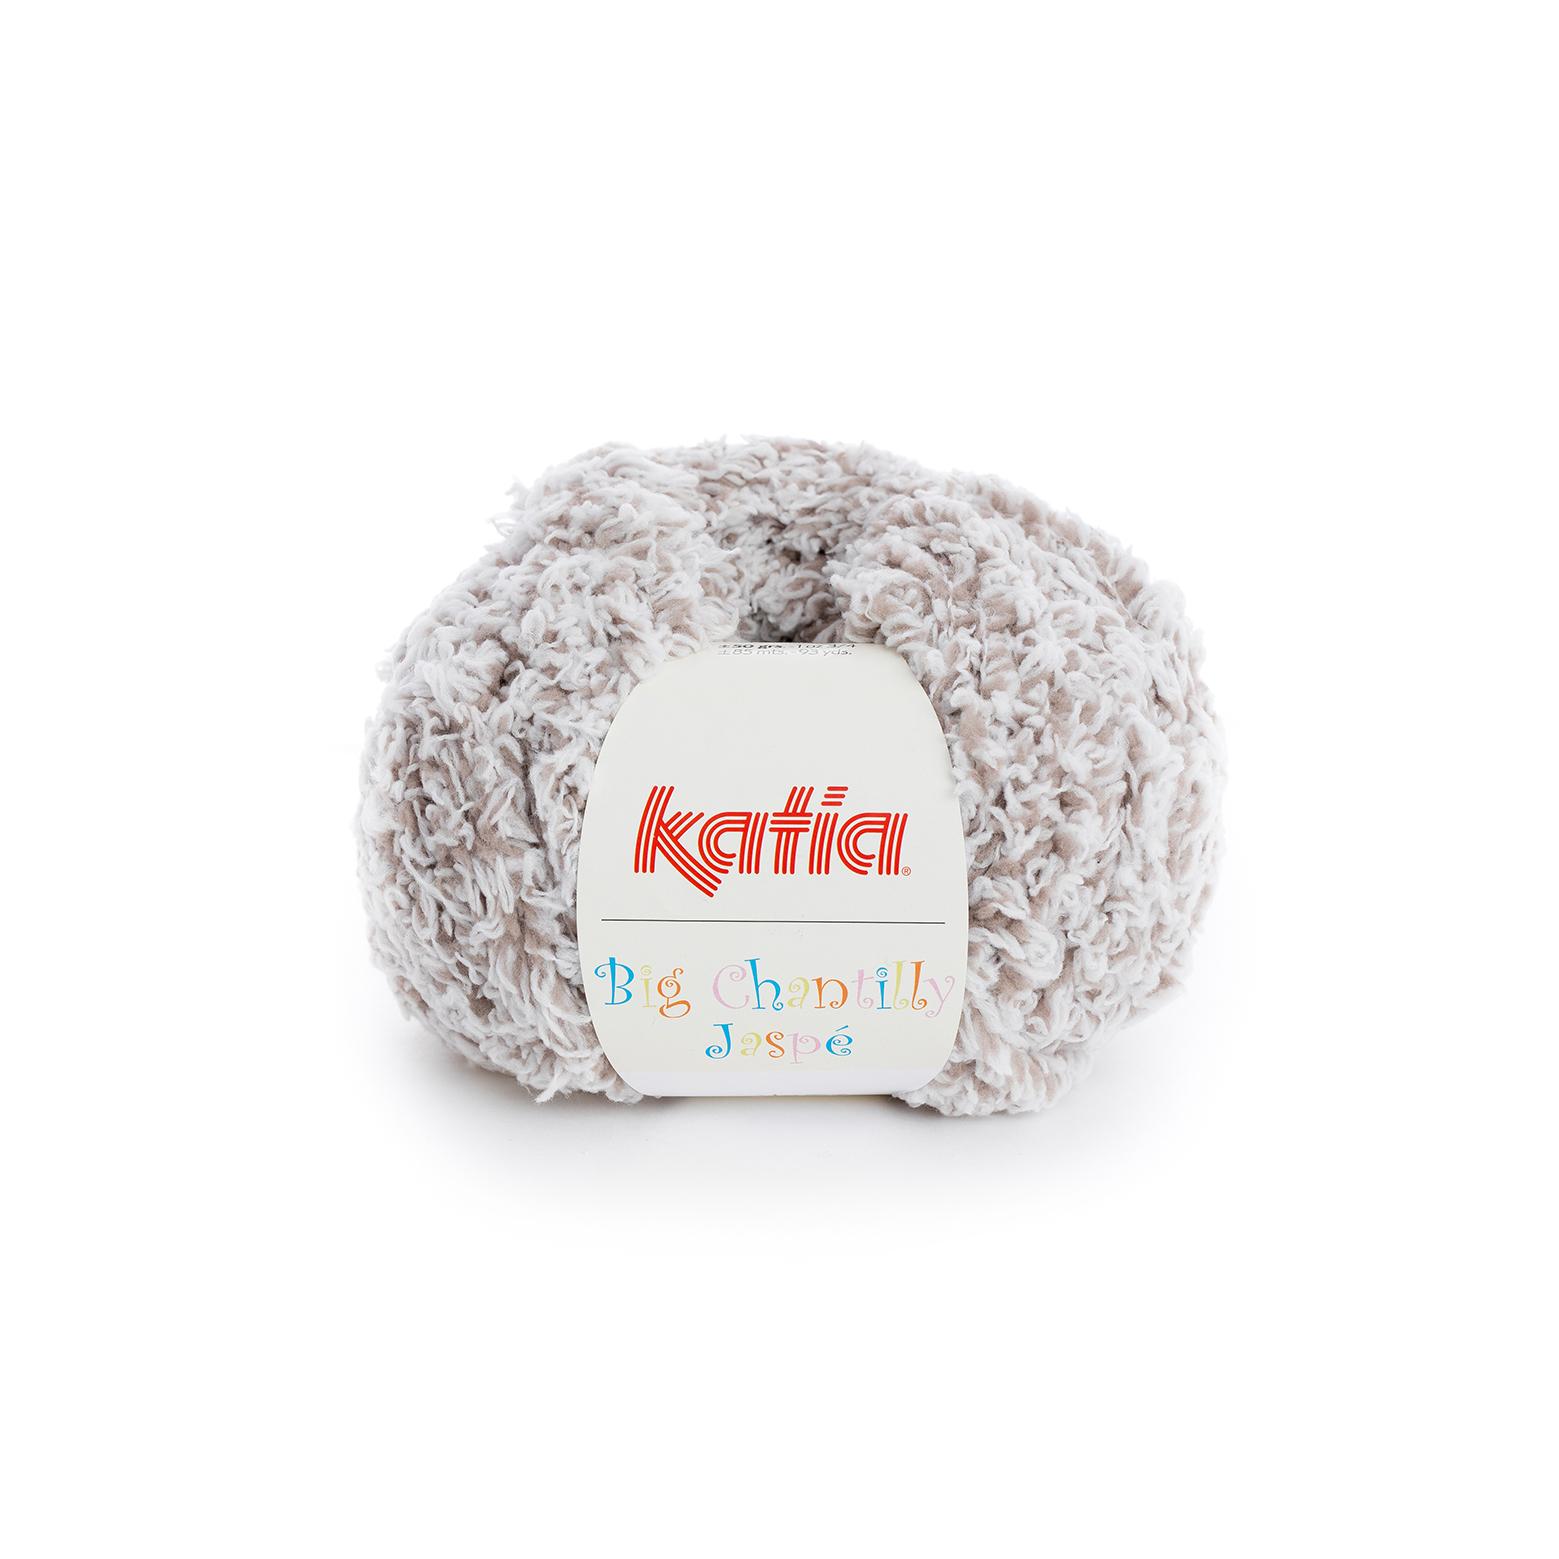 wol-garens-bigchantillyjaspe-breien-polyester-polyamide-wit-reebruin-herfst-winter-katia-252-g